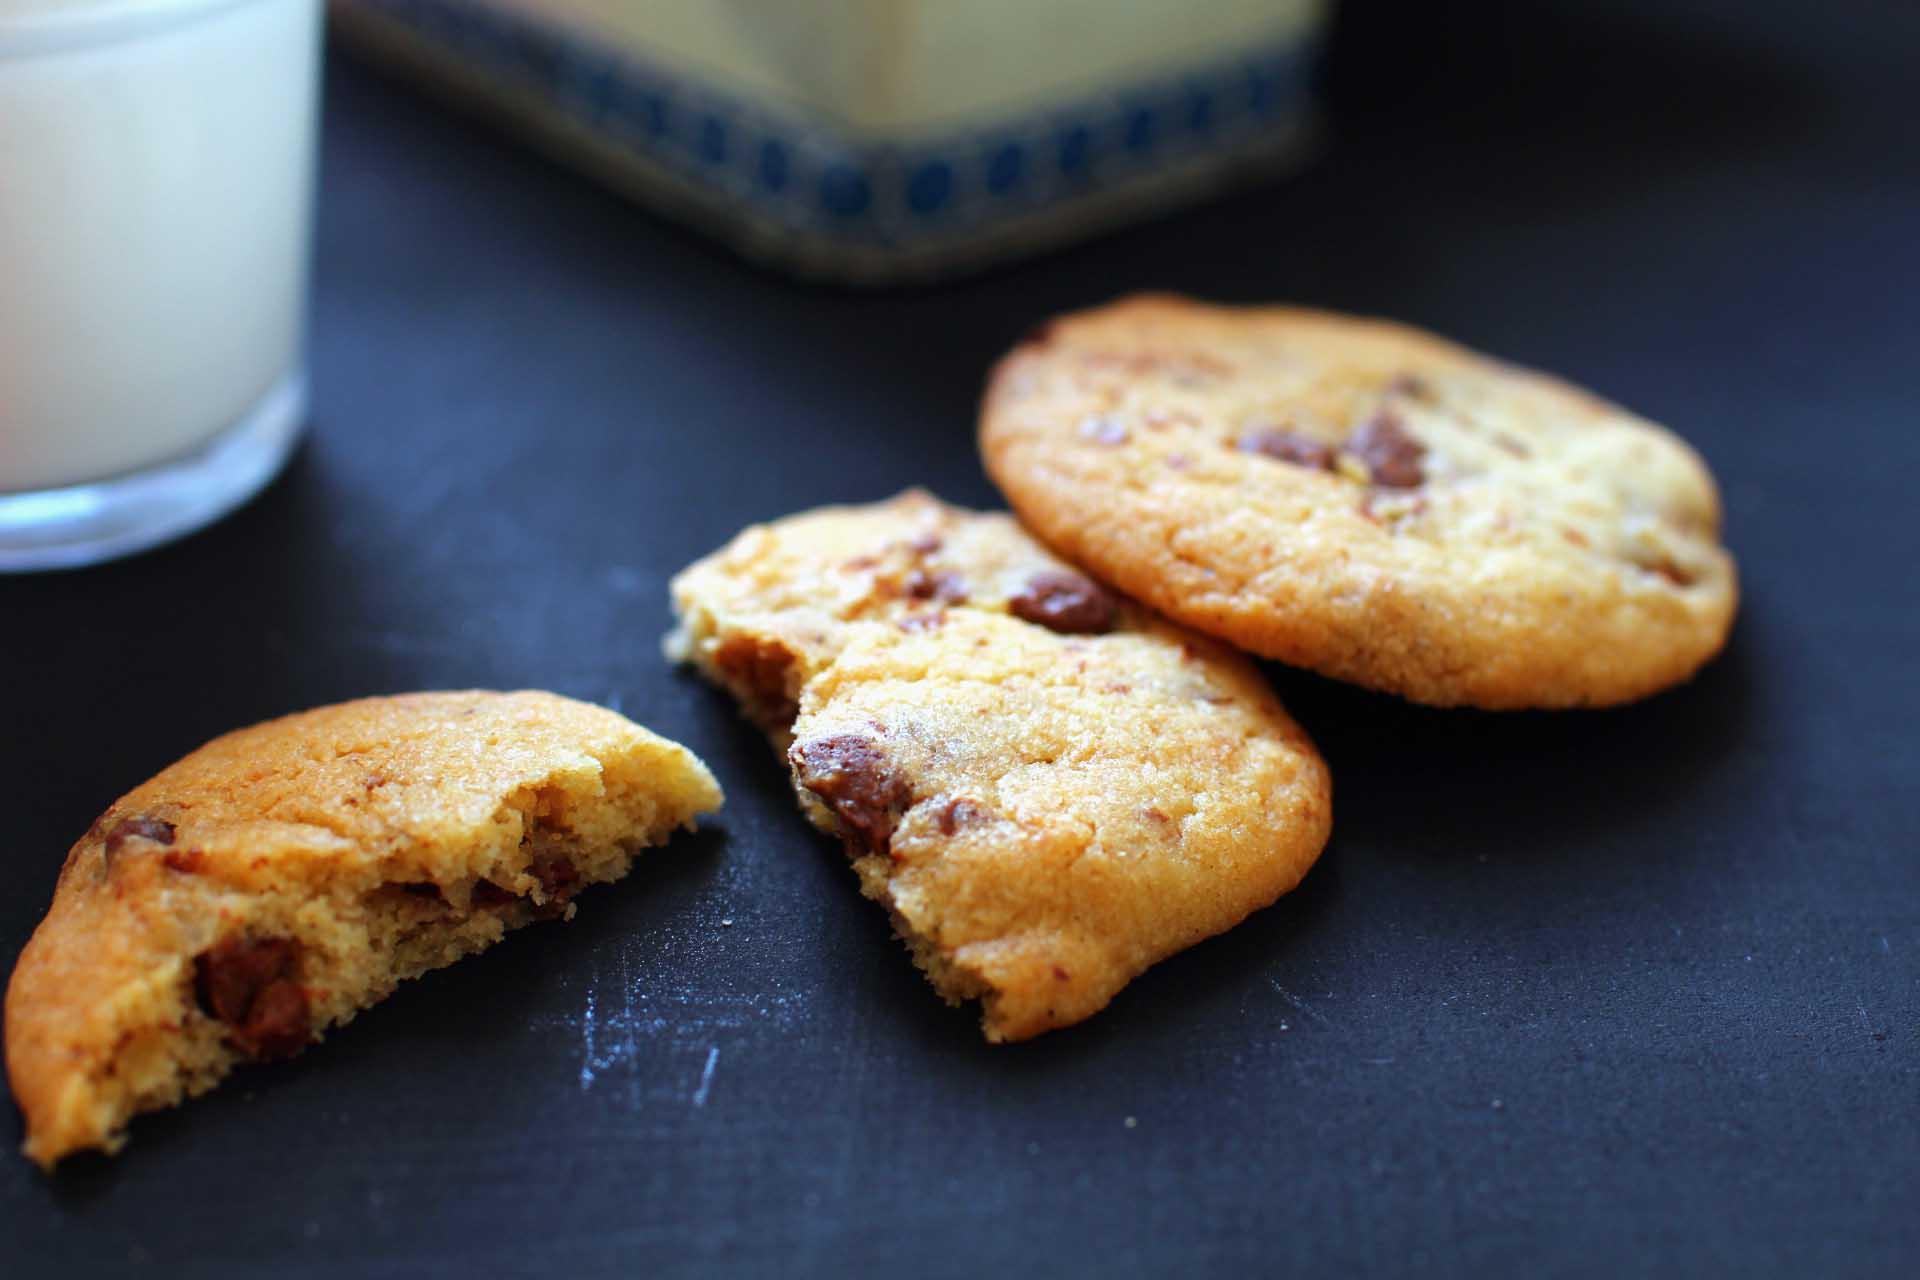 Cookies aux p pites de beurre de cacahu te chocolat inspiration laura todd royal chill - Recette cookies laura todd ...